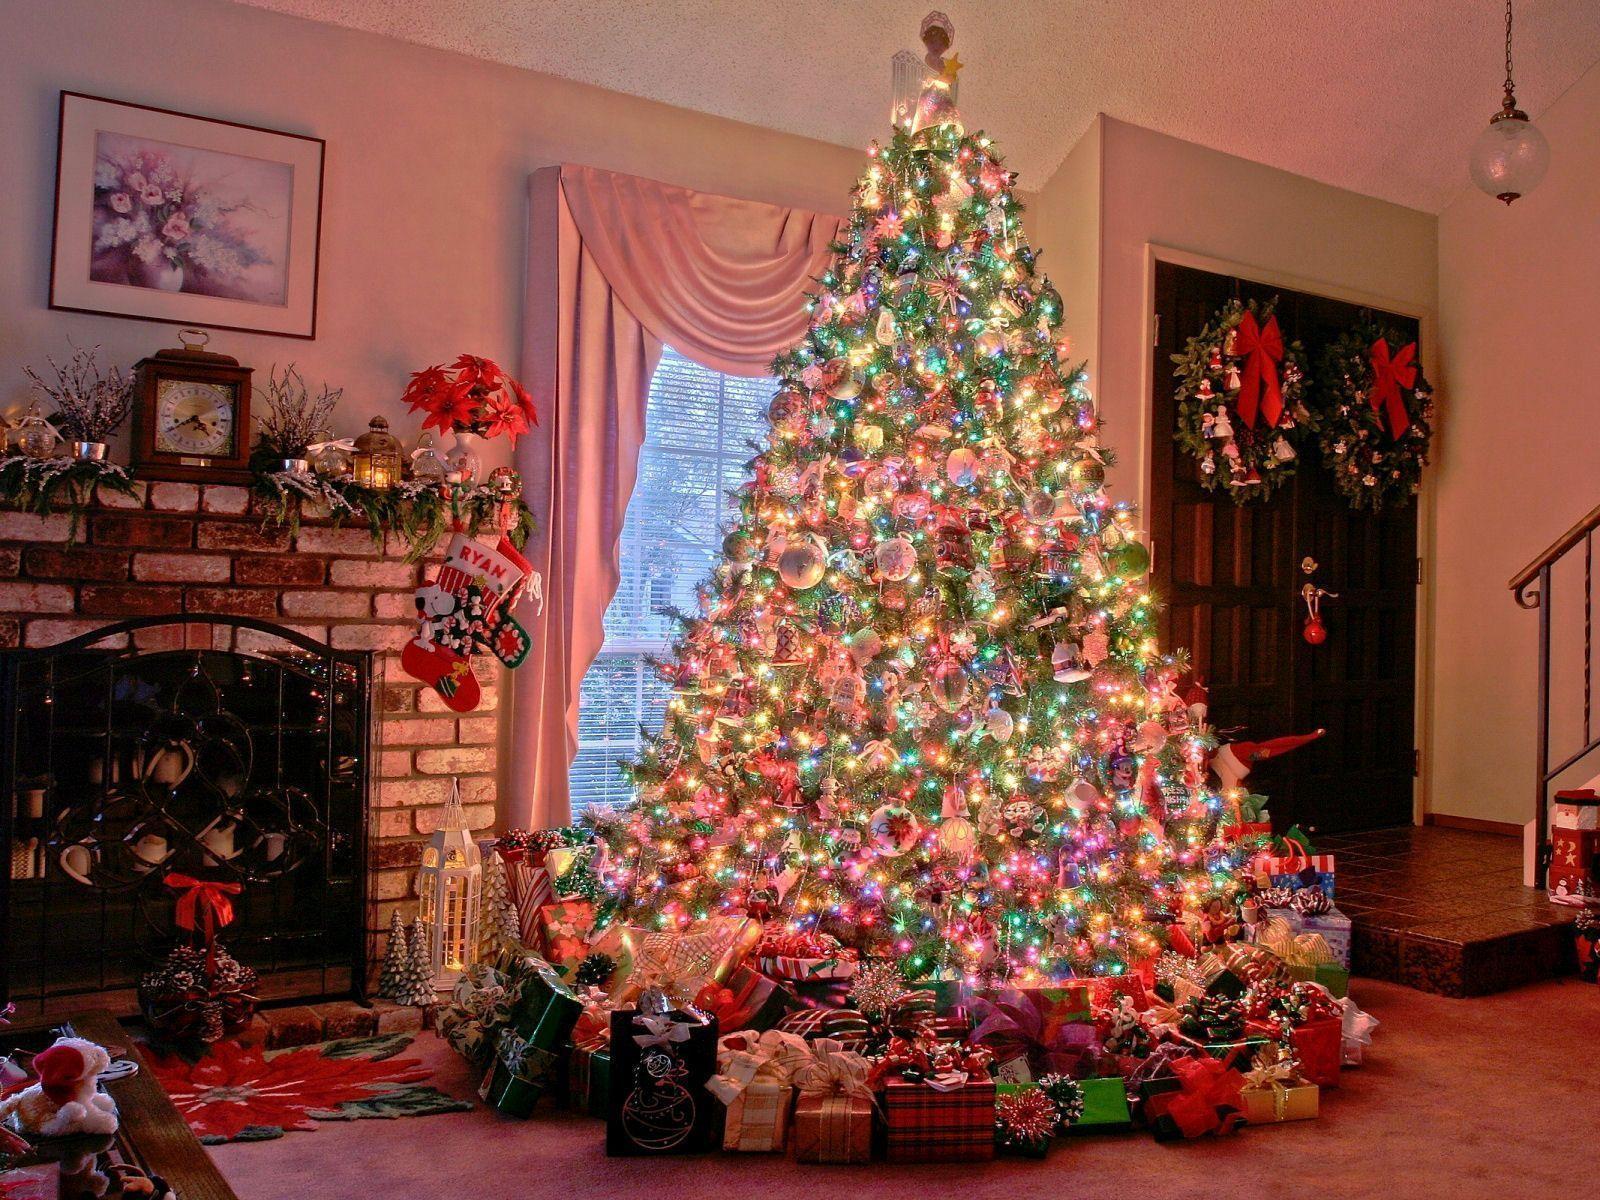 Christmas tree wallpaper backgrounds wallpaper cave christmas tree christmas tree background wallpapers desktop voltagebd Gallery